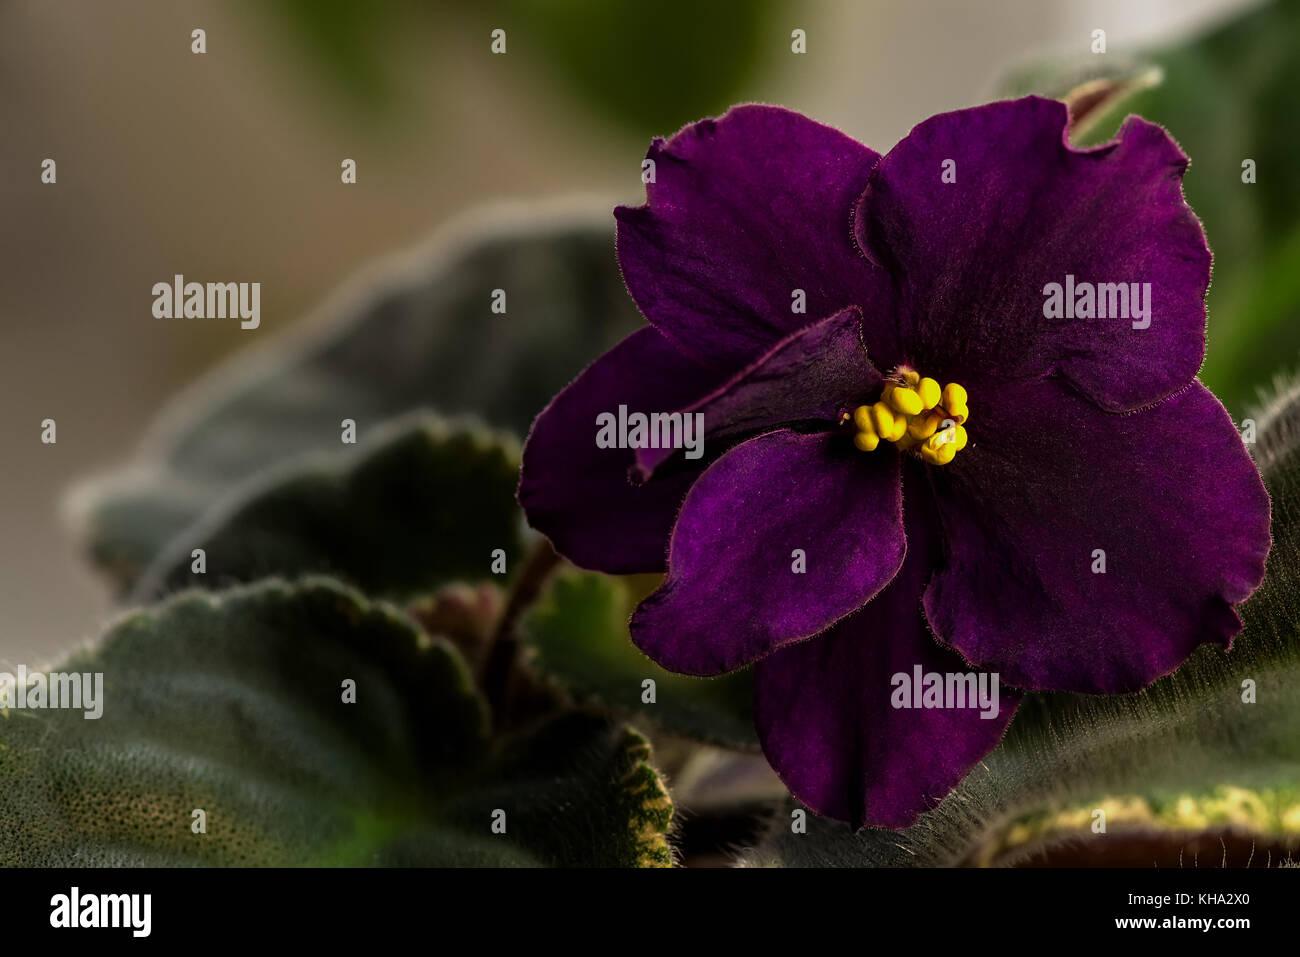 Dark Purple Flower Of Violet With Yellow Stamens Stock Photo